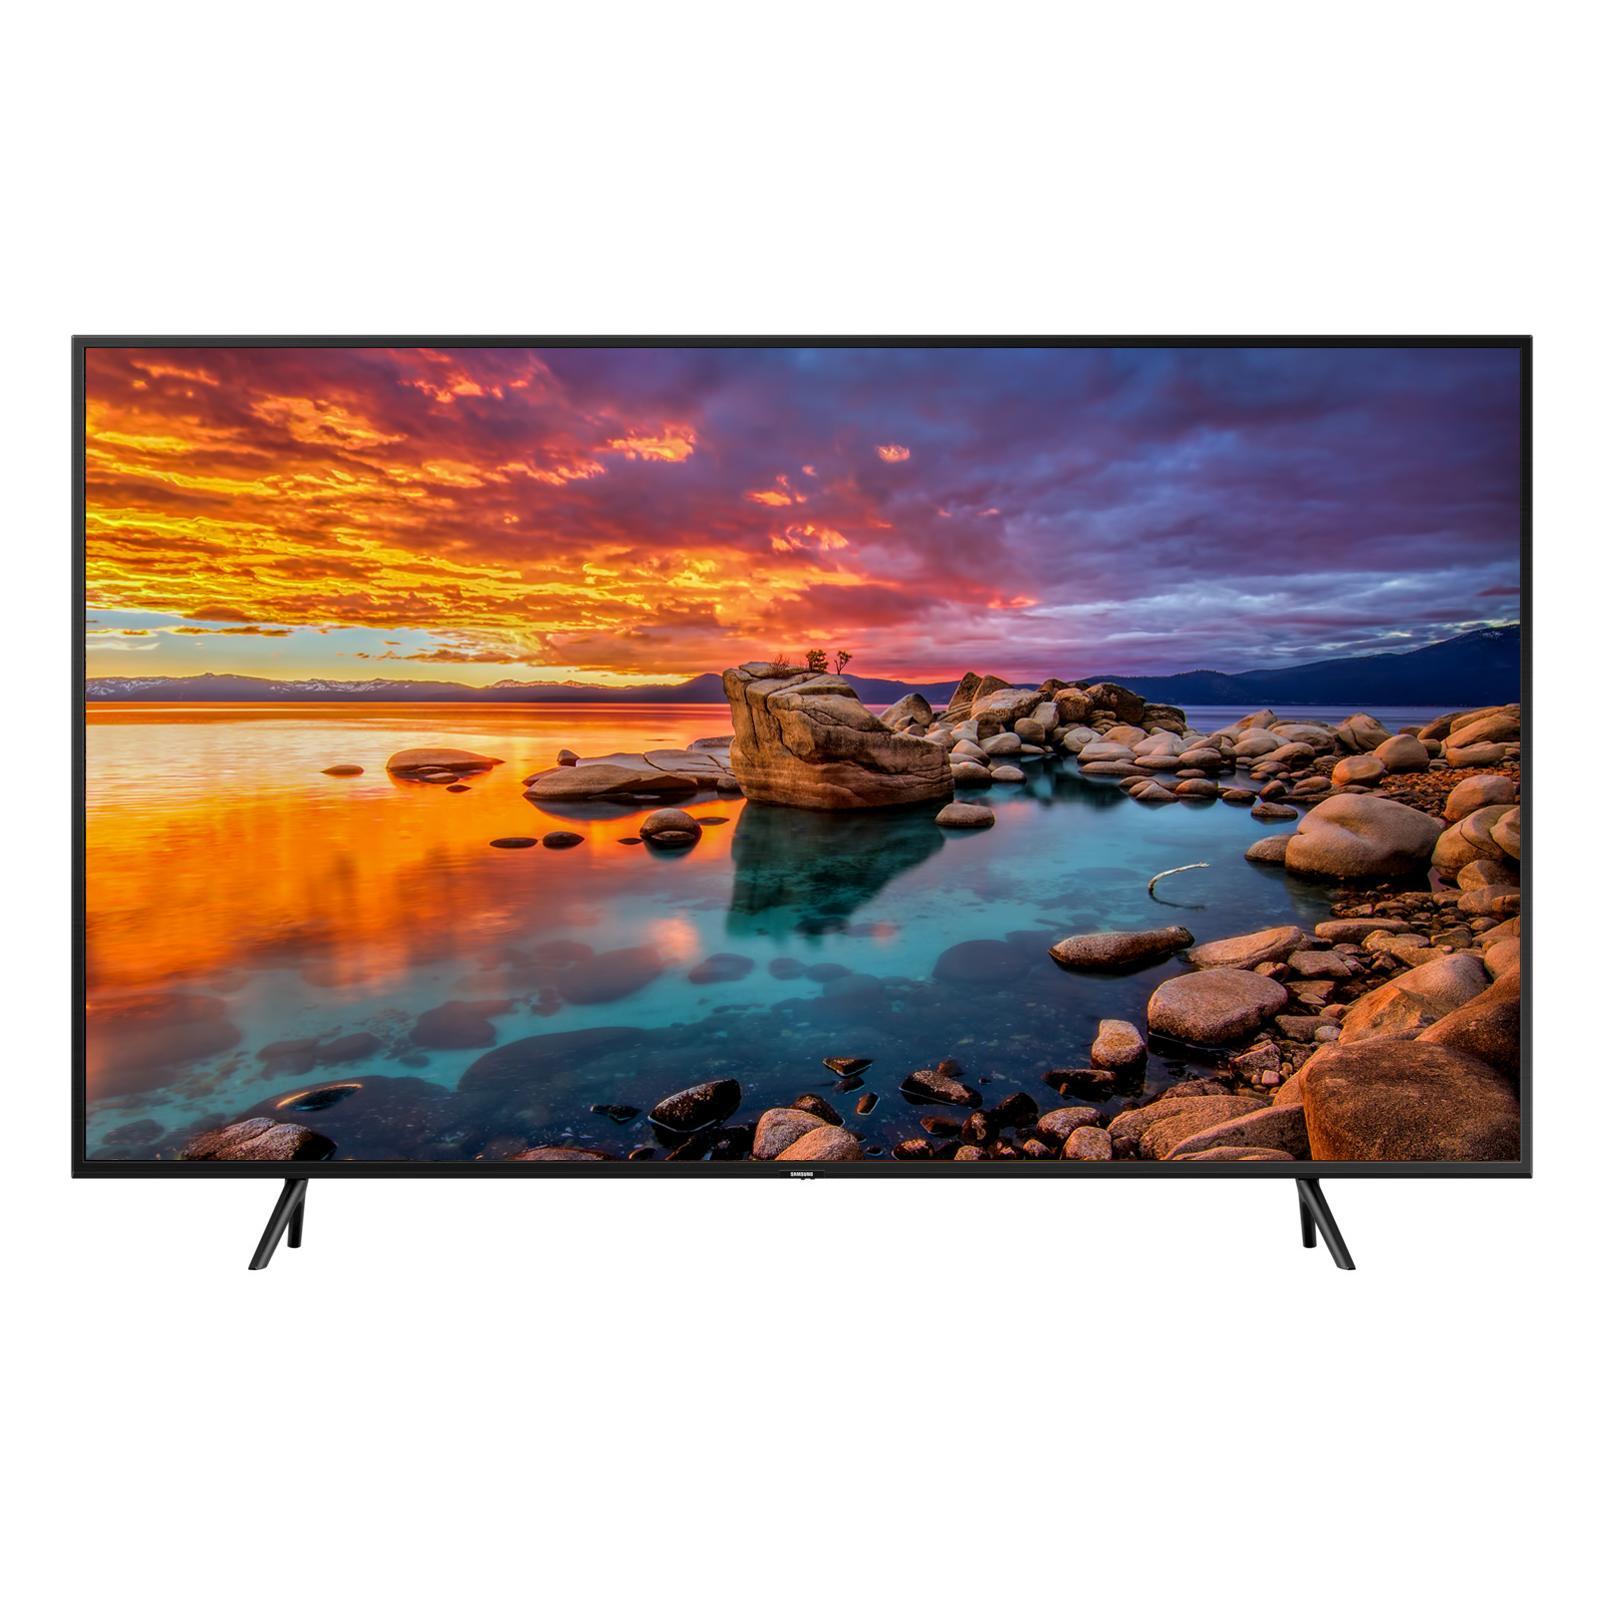 Samsung Gq65q6fngt Qled Tv 65 Zoll | Smart TV Reviews